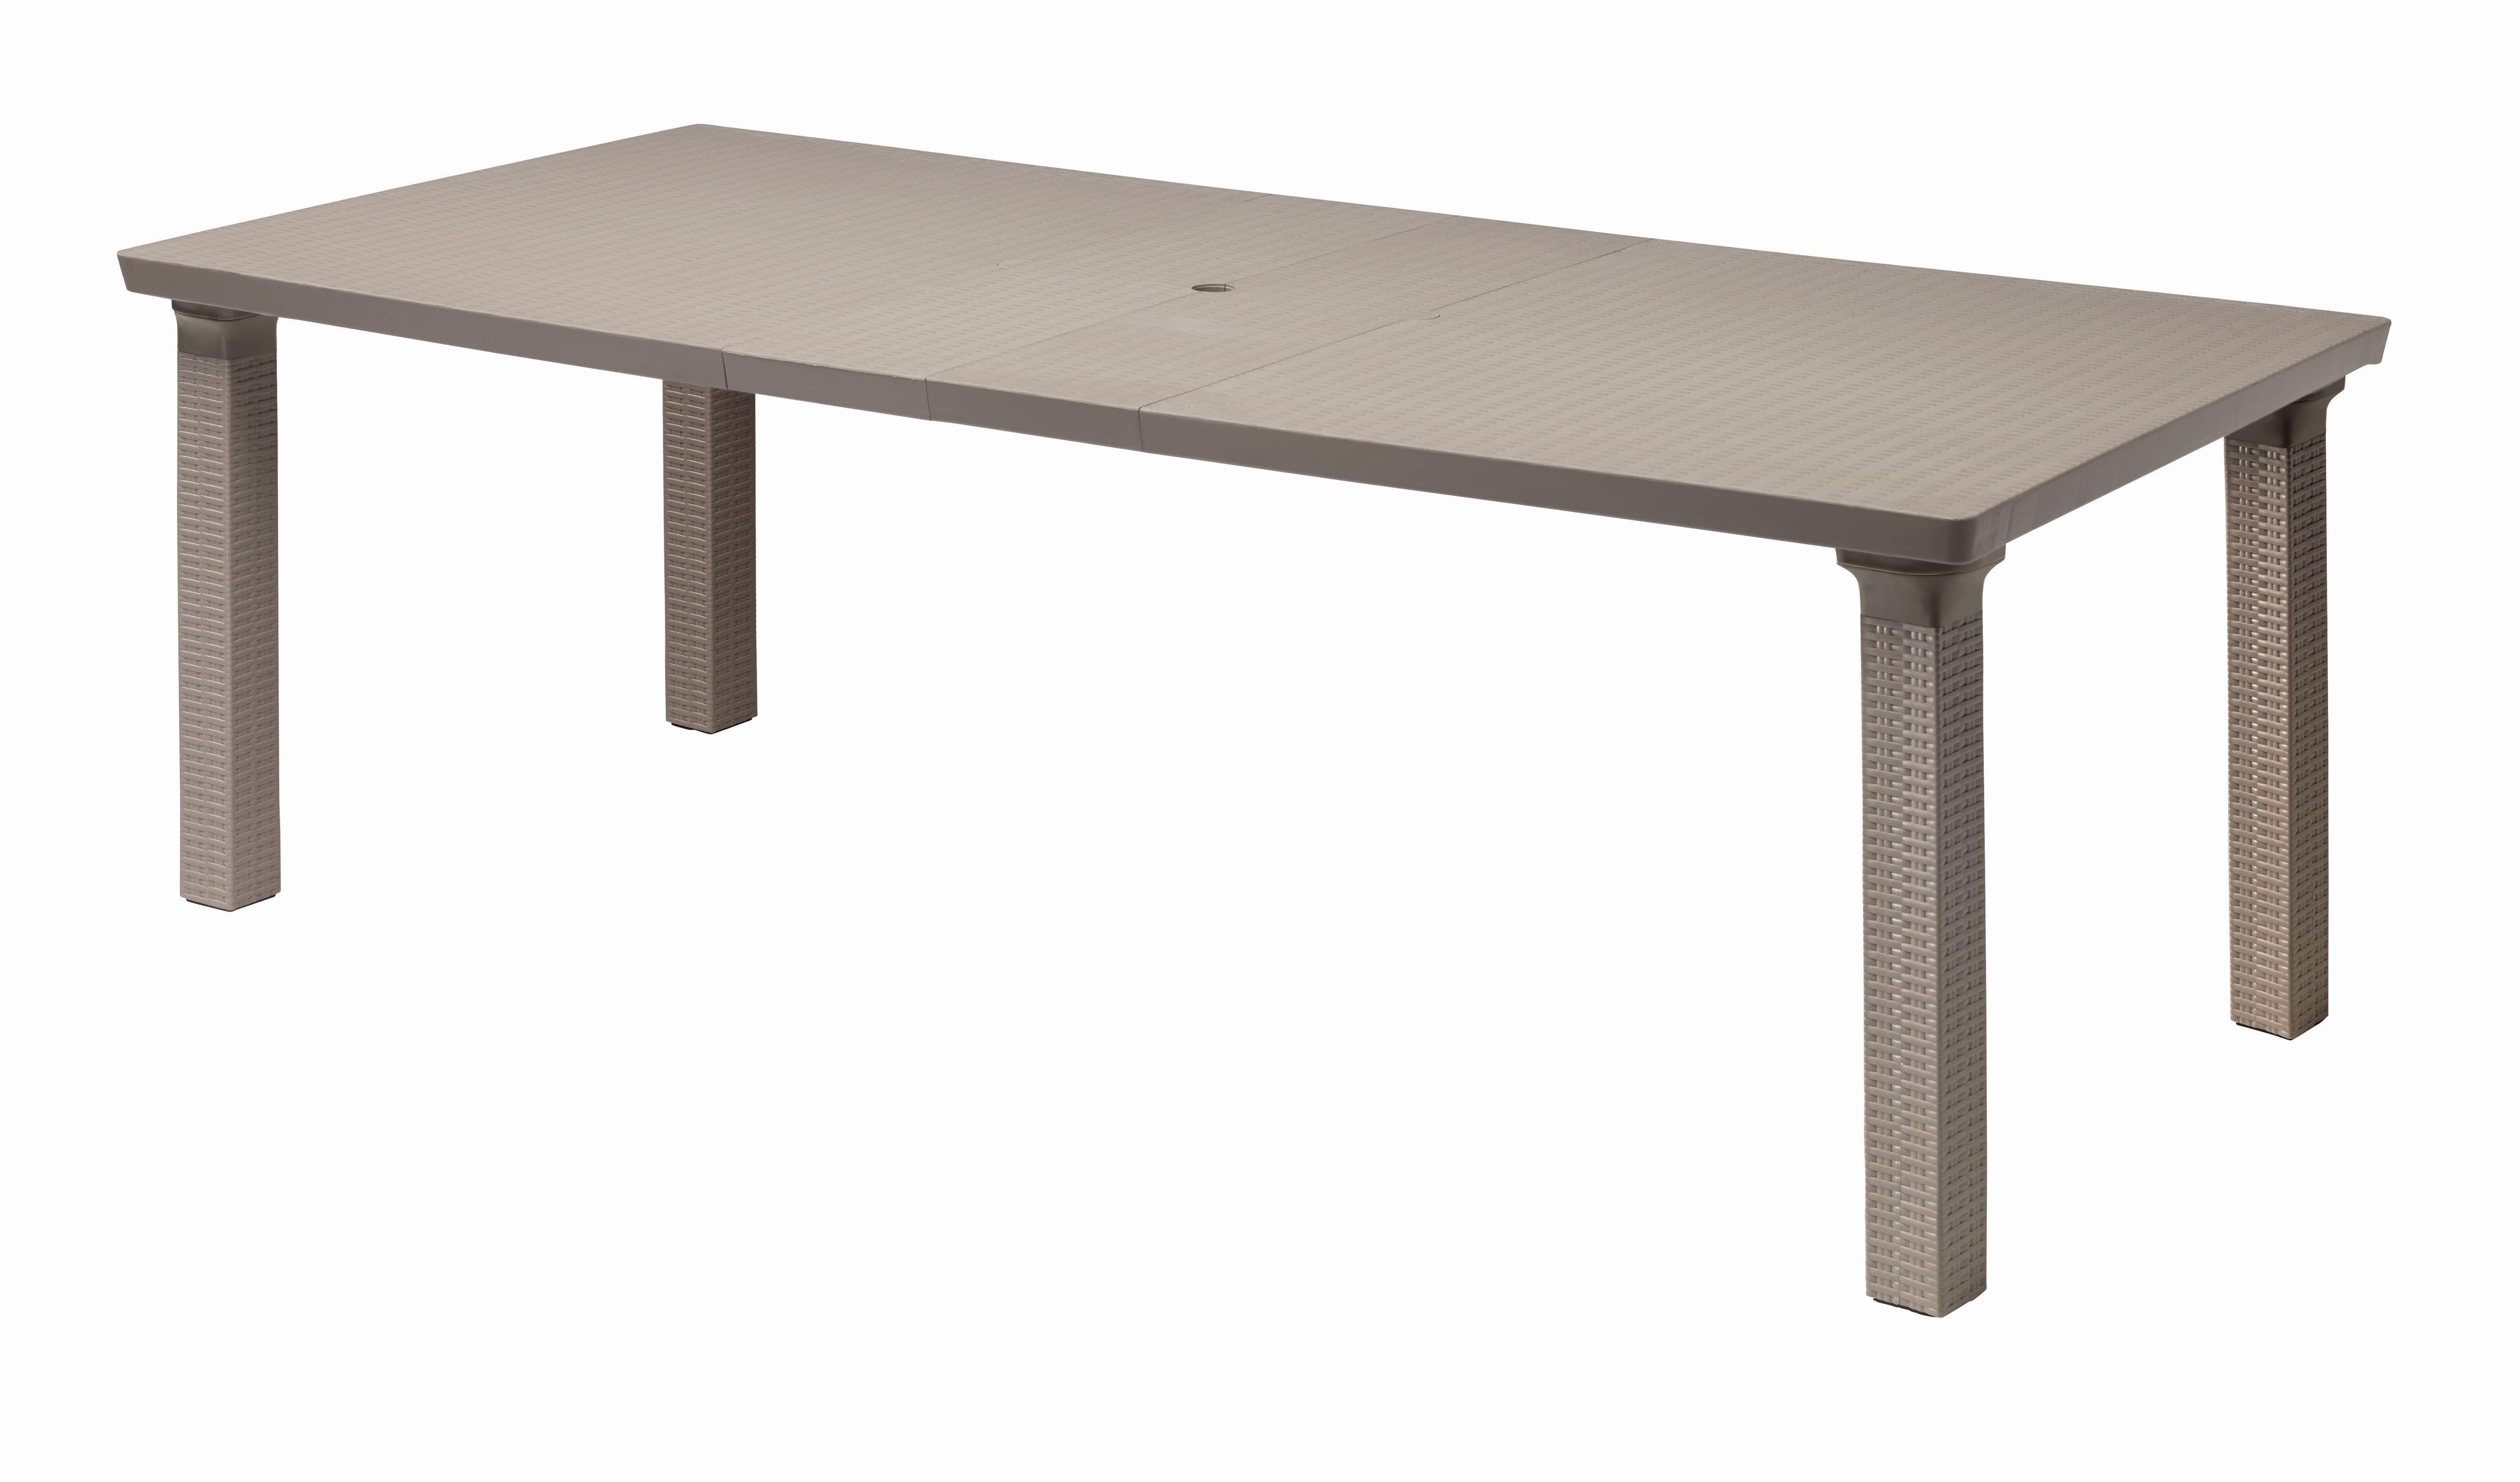 Triplo, Outdoor rectangular table, extendable